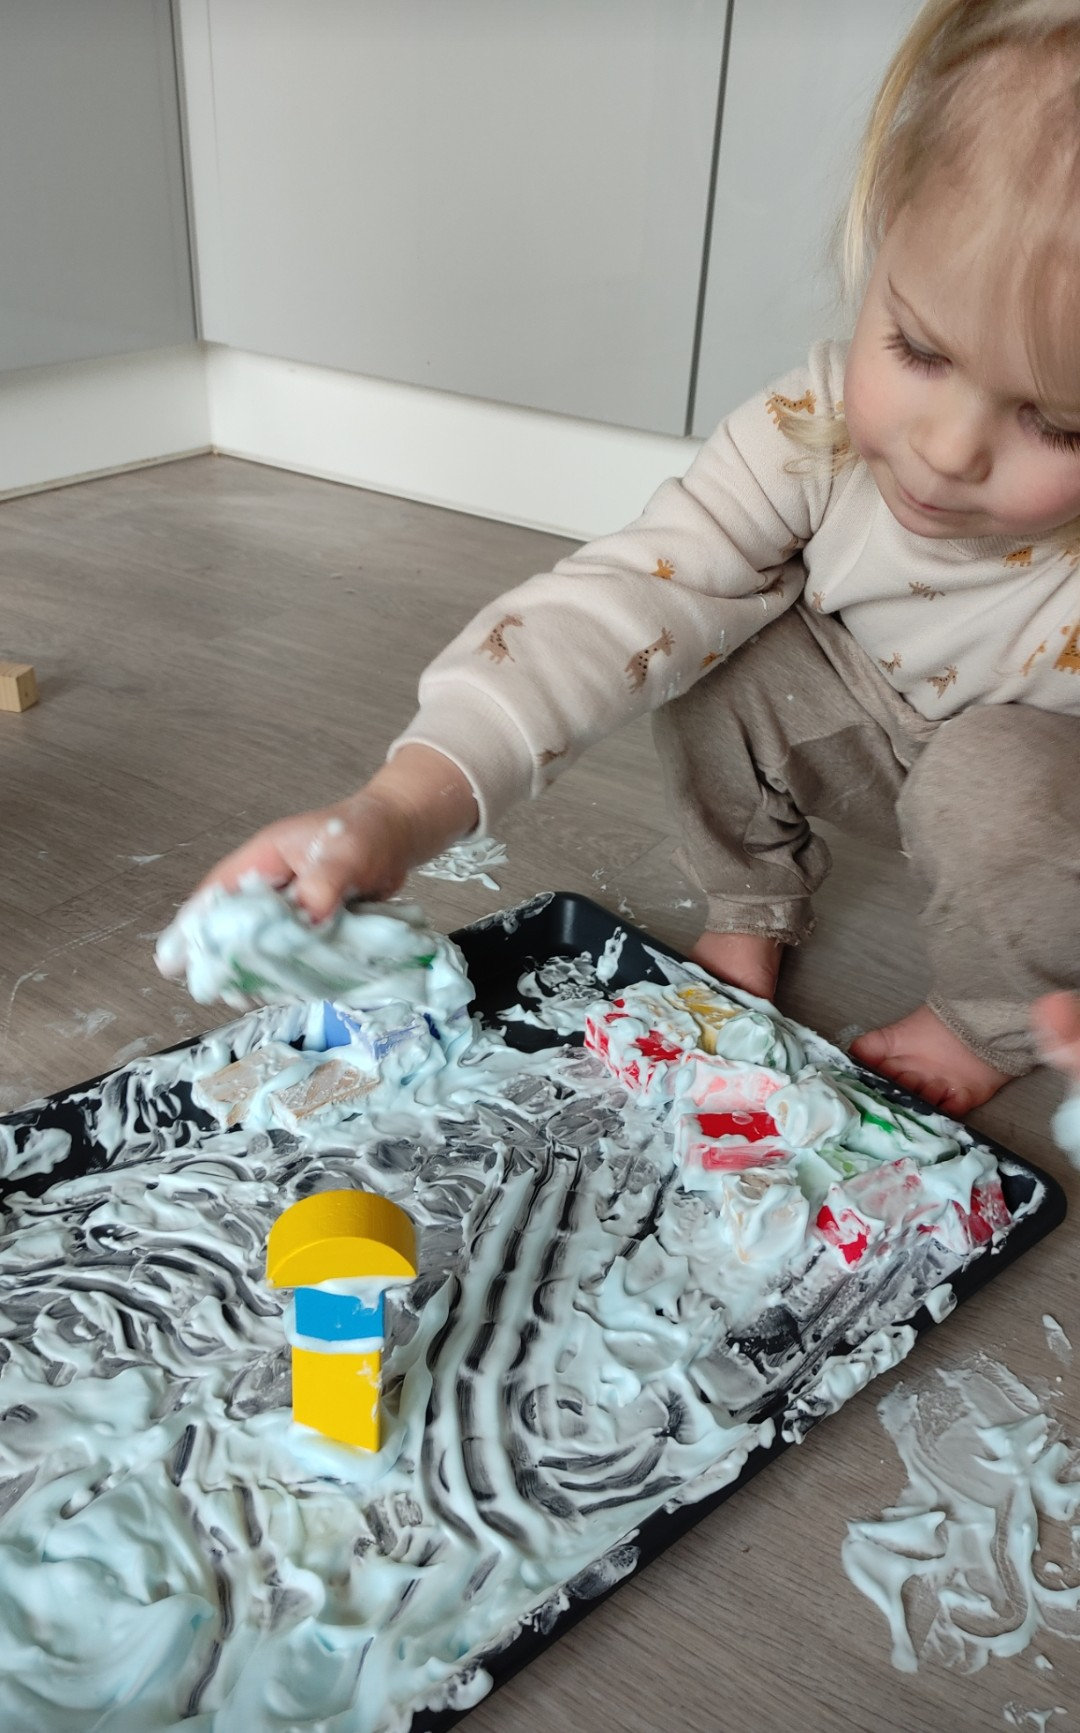 Toddler Messy Play